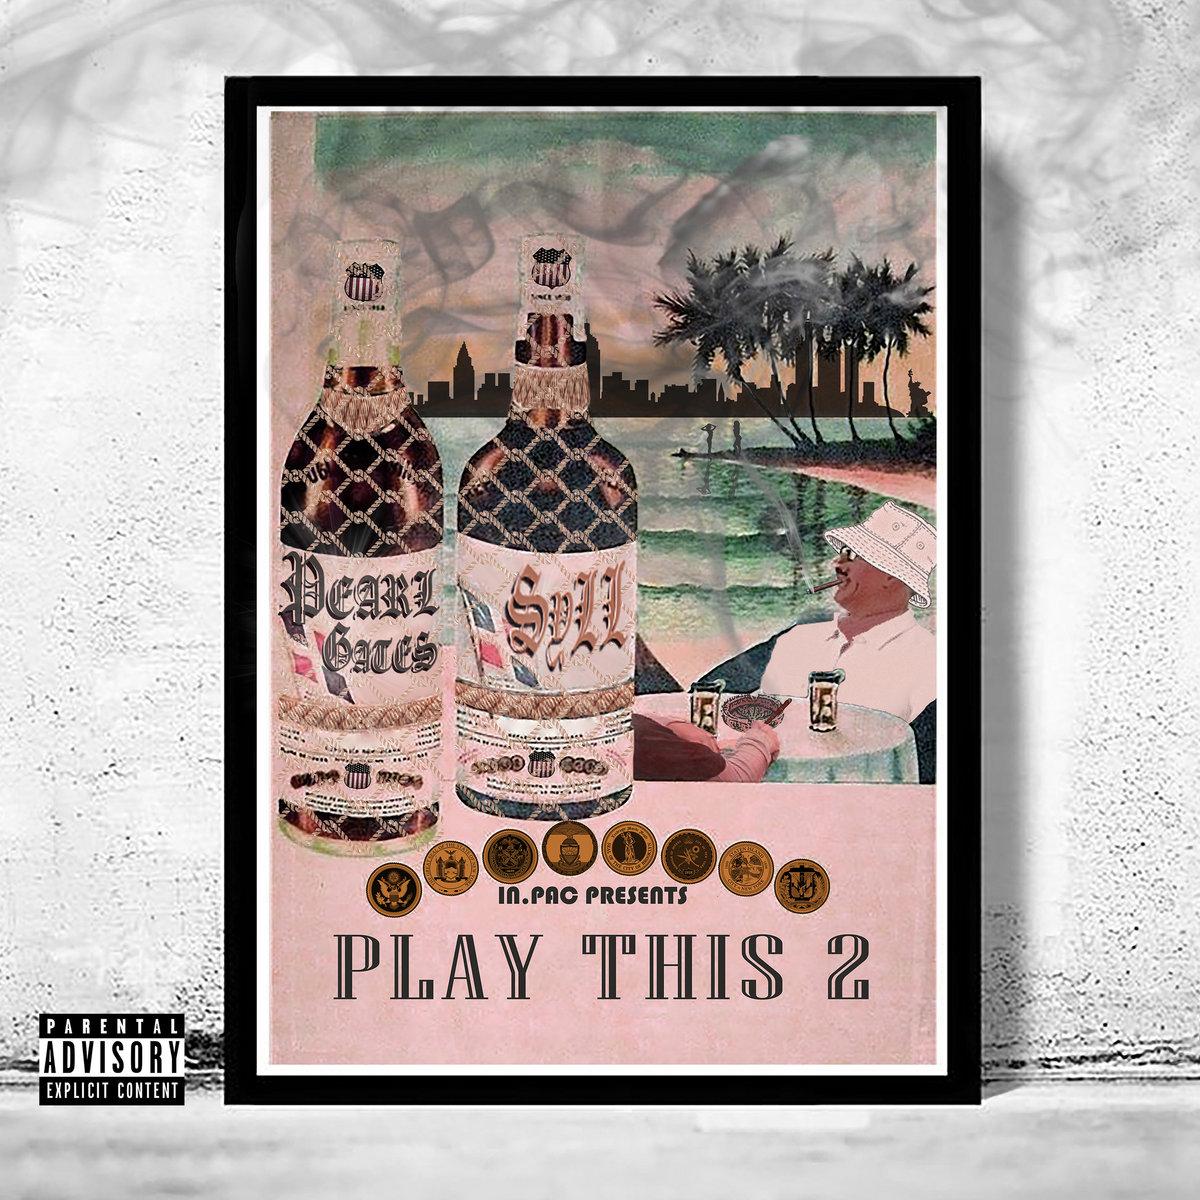 Pearl_gates___syll___play_this_2